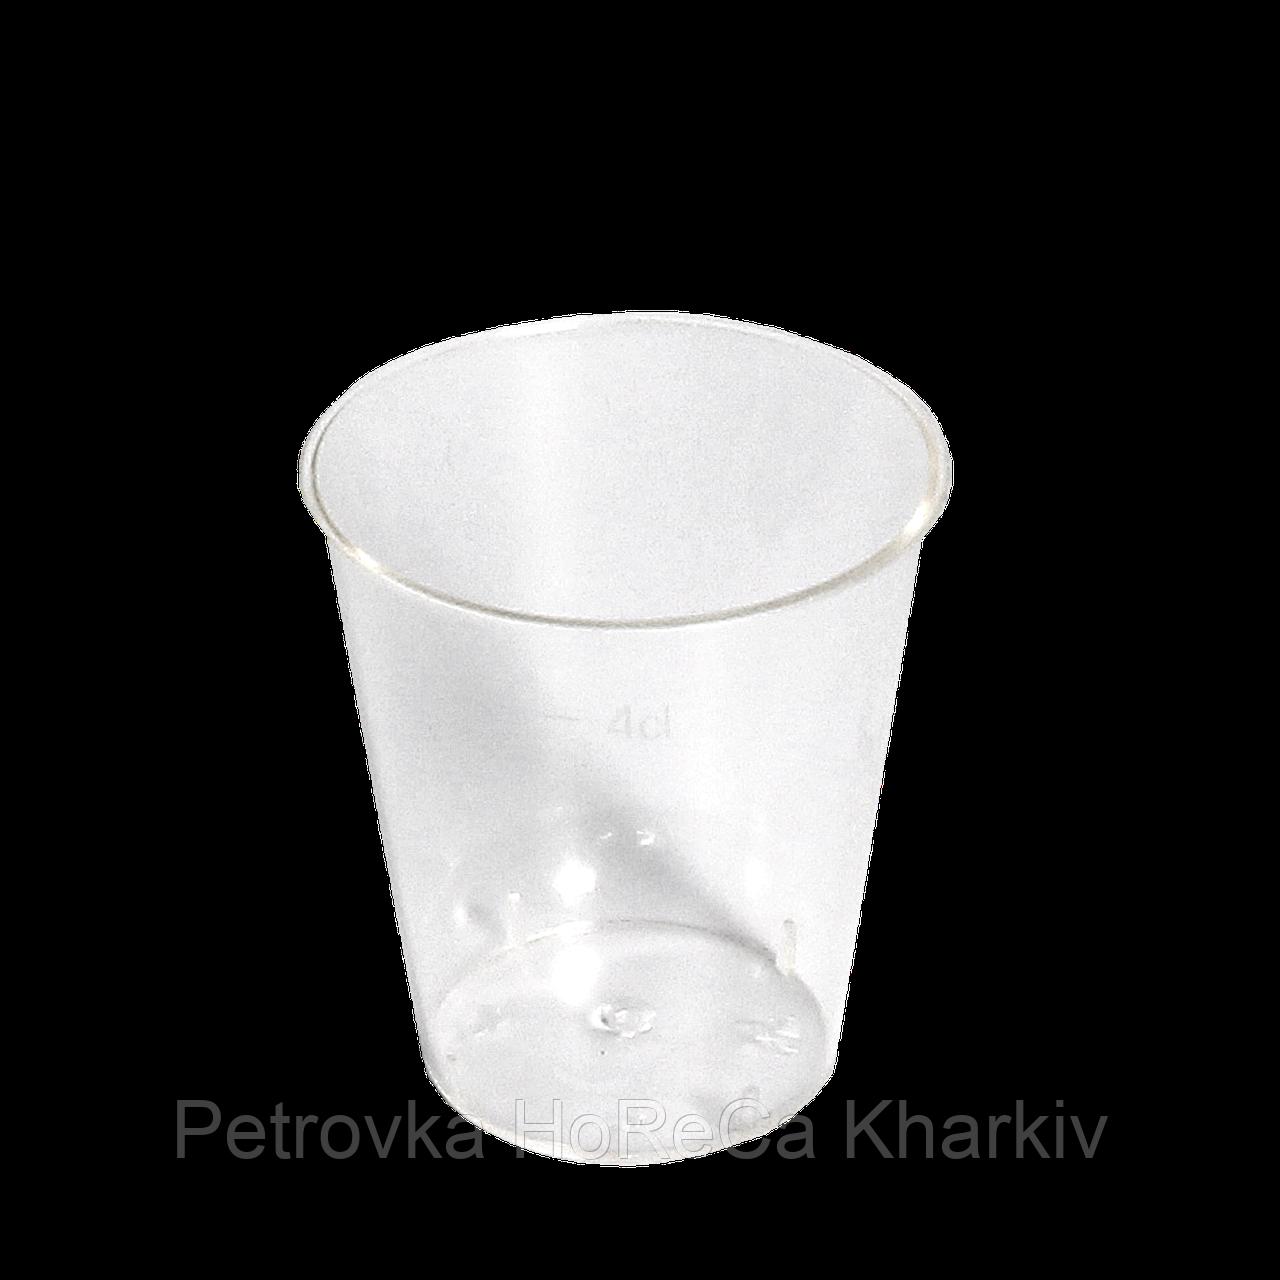 Рюмка стеклоподобная, обьем 40 гр ( без ножки), уп/40шт